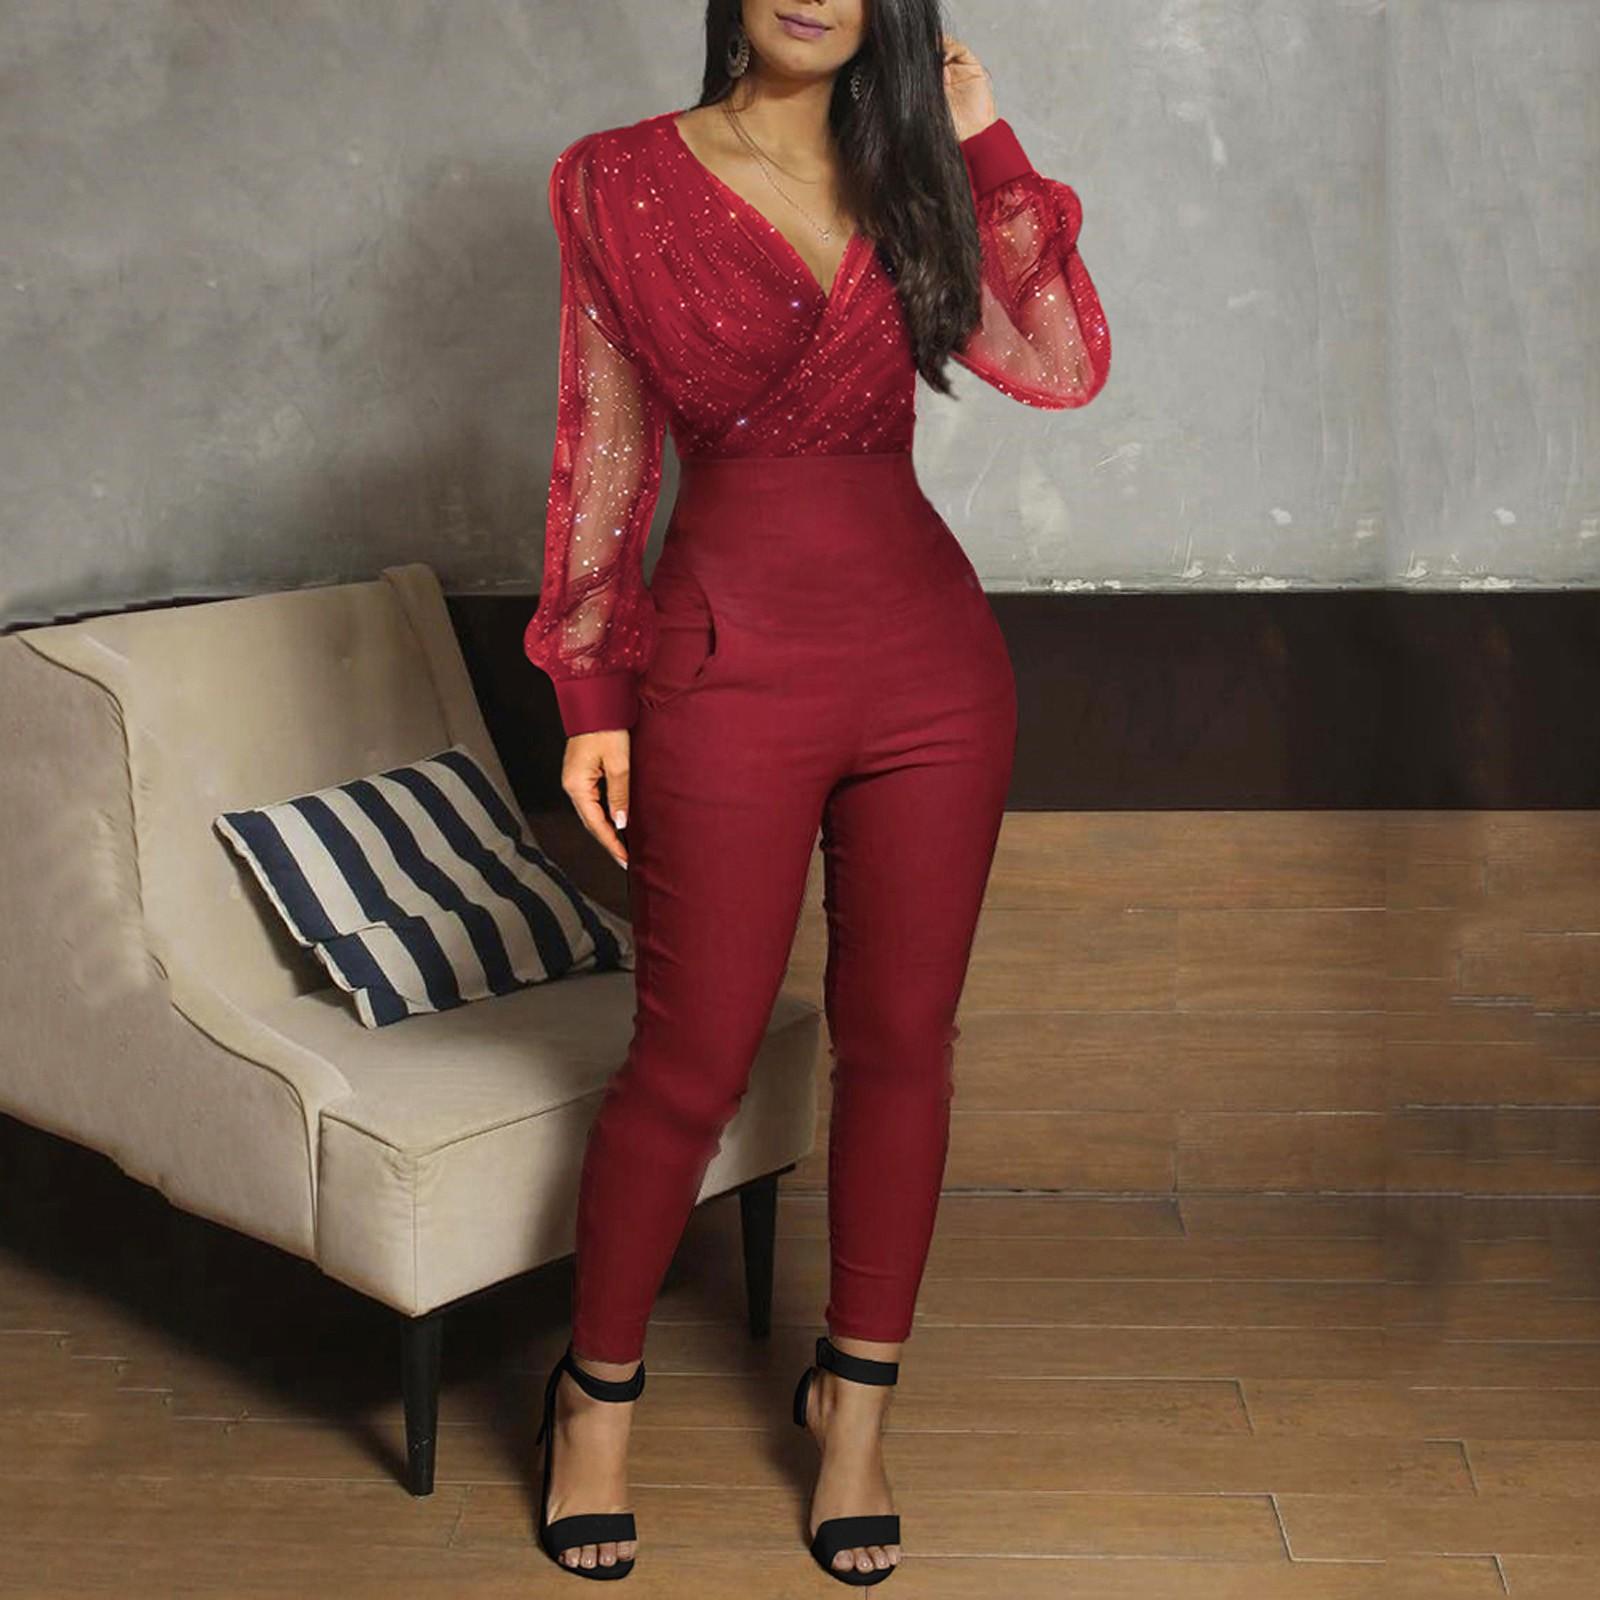 40# Women's Bodysuit Fashion V neck Jumpsuit women Sequined Mesh Long Rompers Long Sleeve Party Pocket ropa de mujer